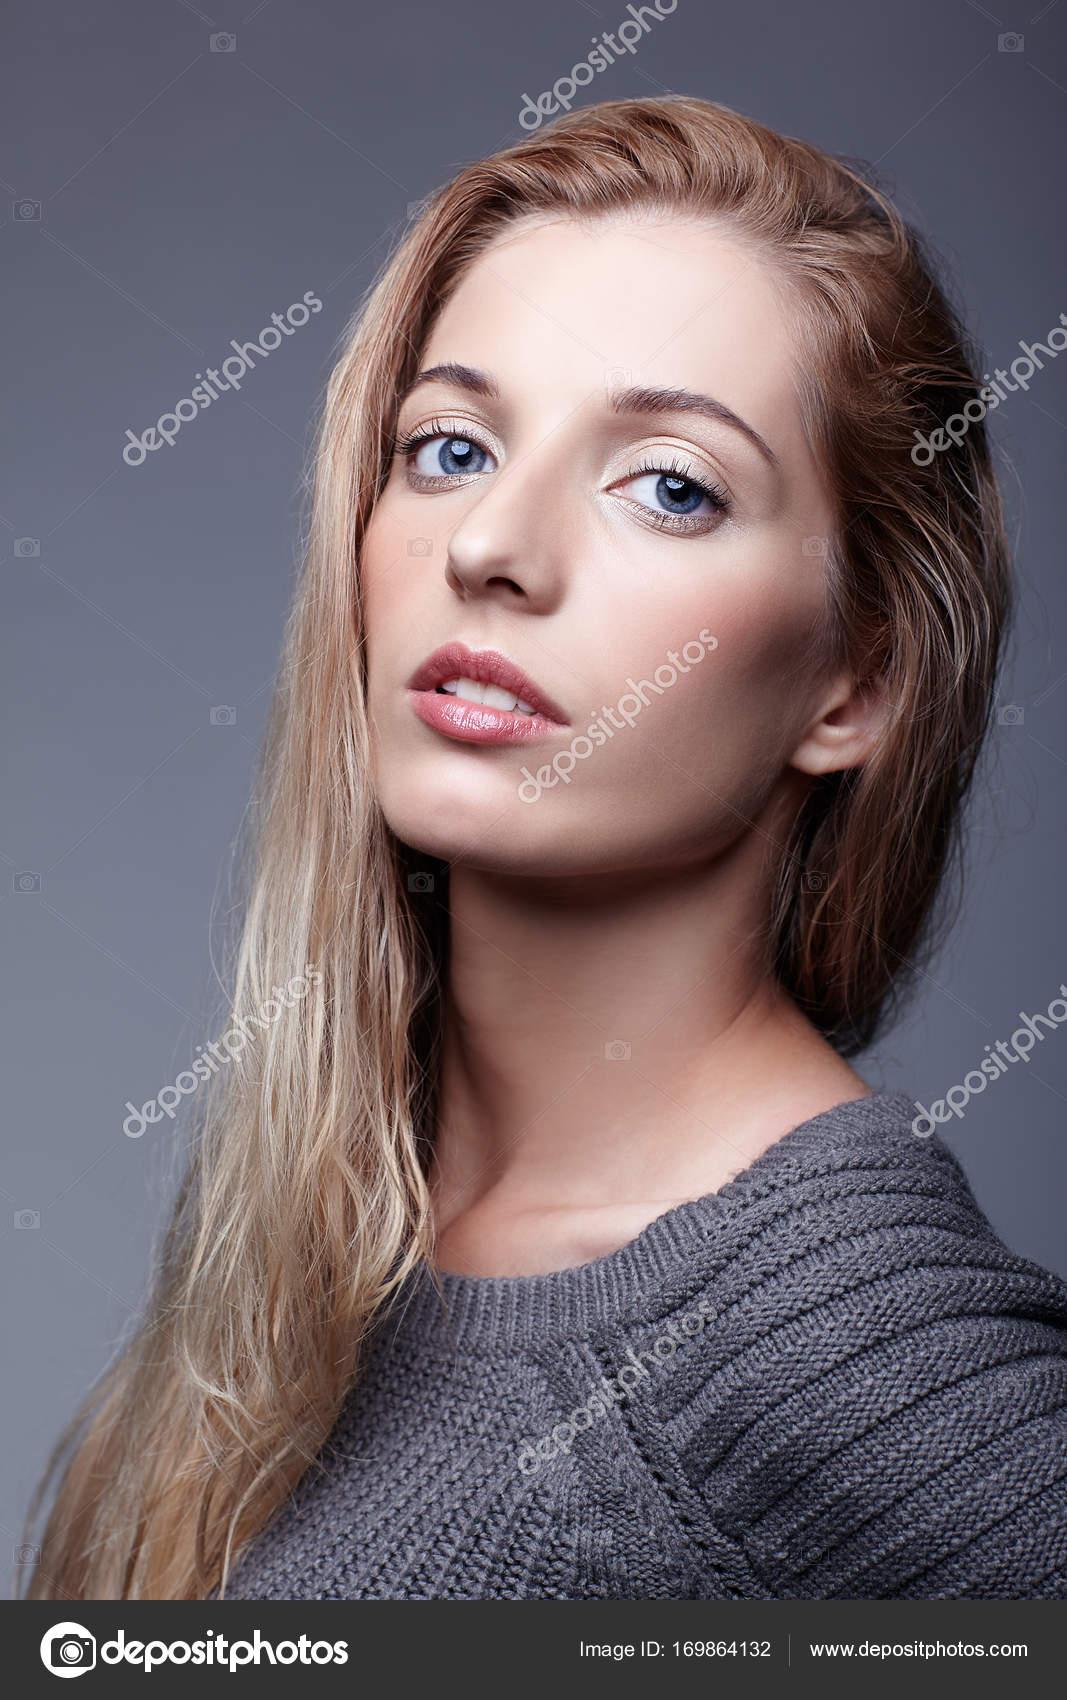 2d3730e2e39b Πορτρέτο της νεαρής γυναίκας σε γκρι μάλλινο πουλόβερ. Όμορφο κορίτσι σ — Φωτογραφία  Αρχείου